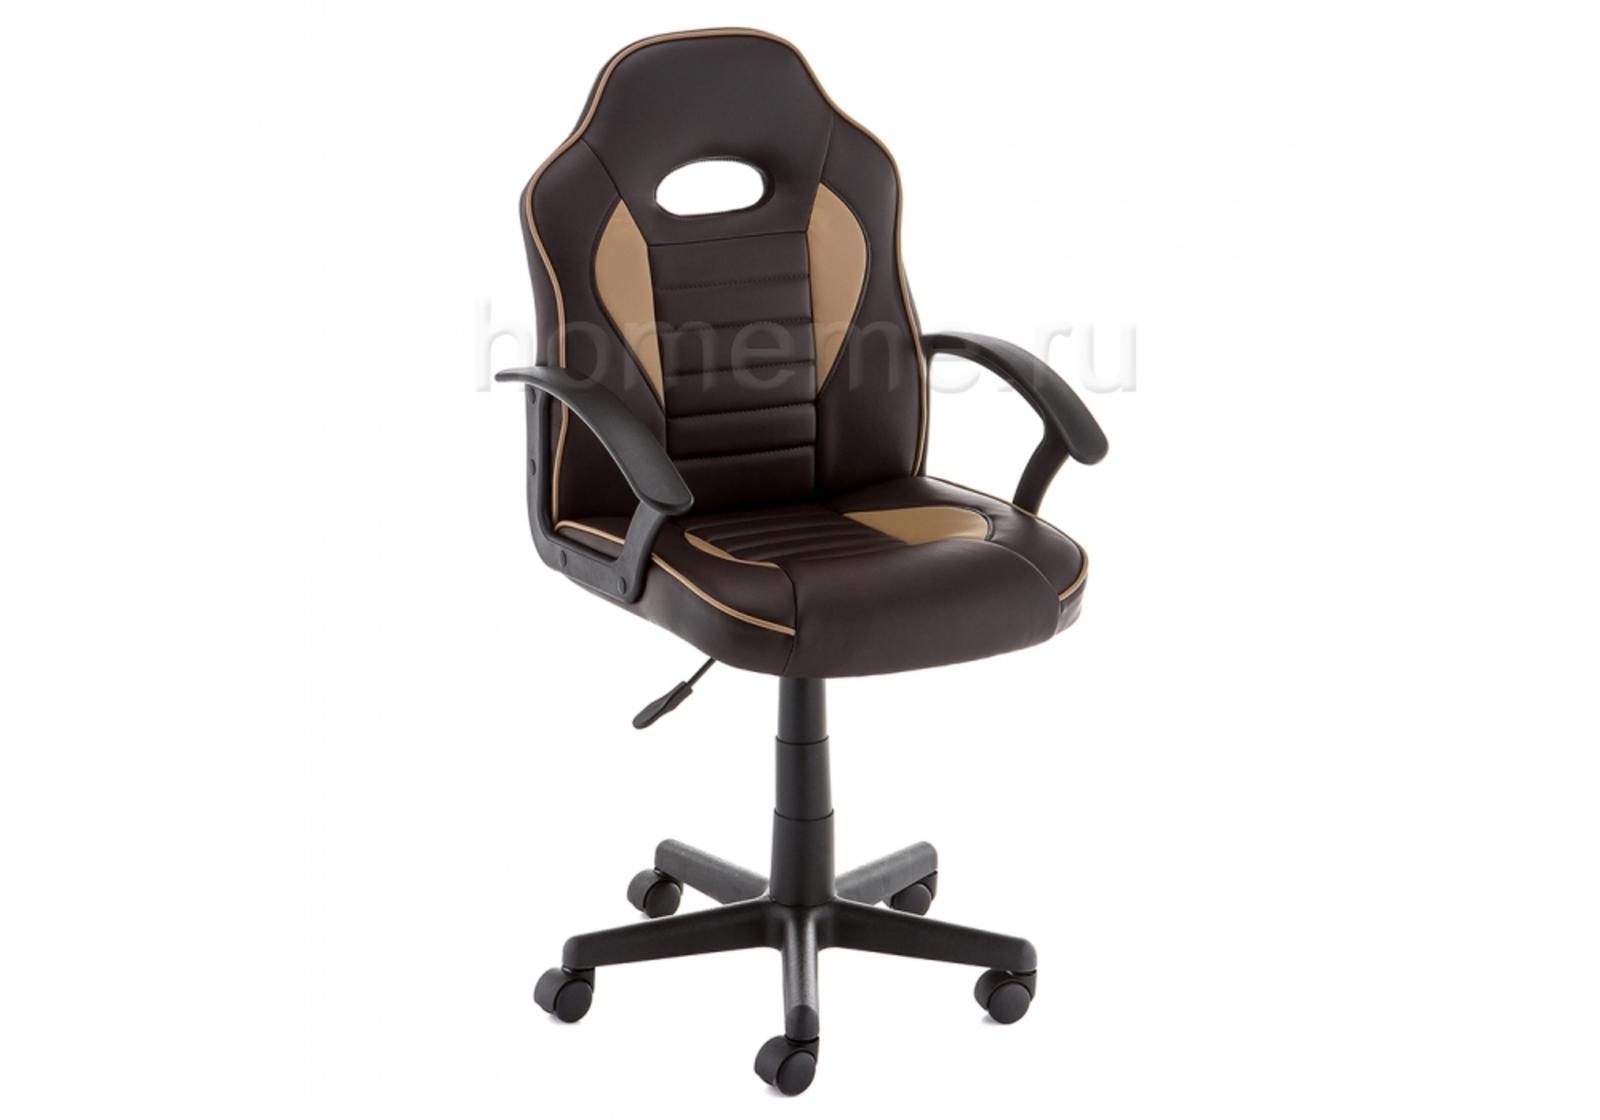 Кресло для офиса HomeMe Danger коричневое 11260 от Homeme.ru